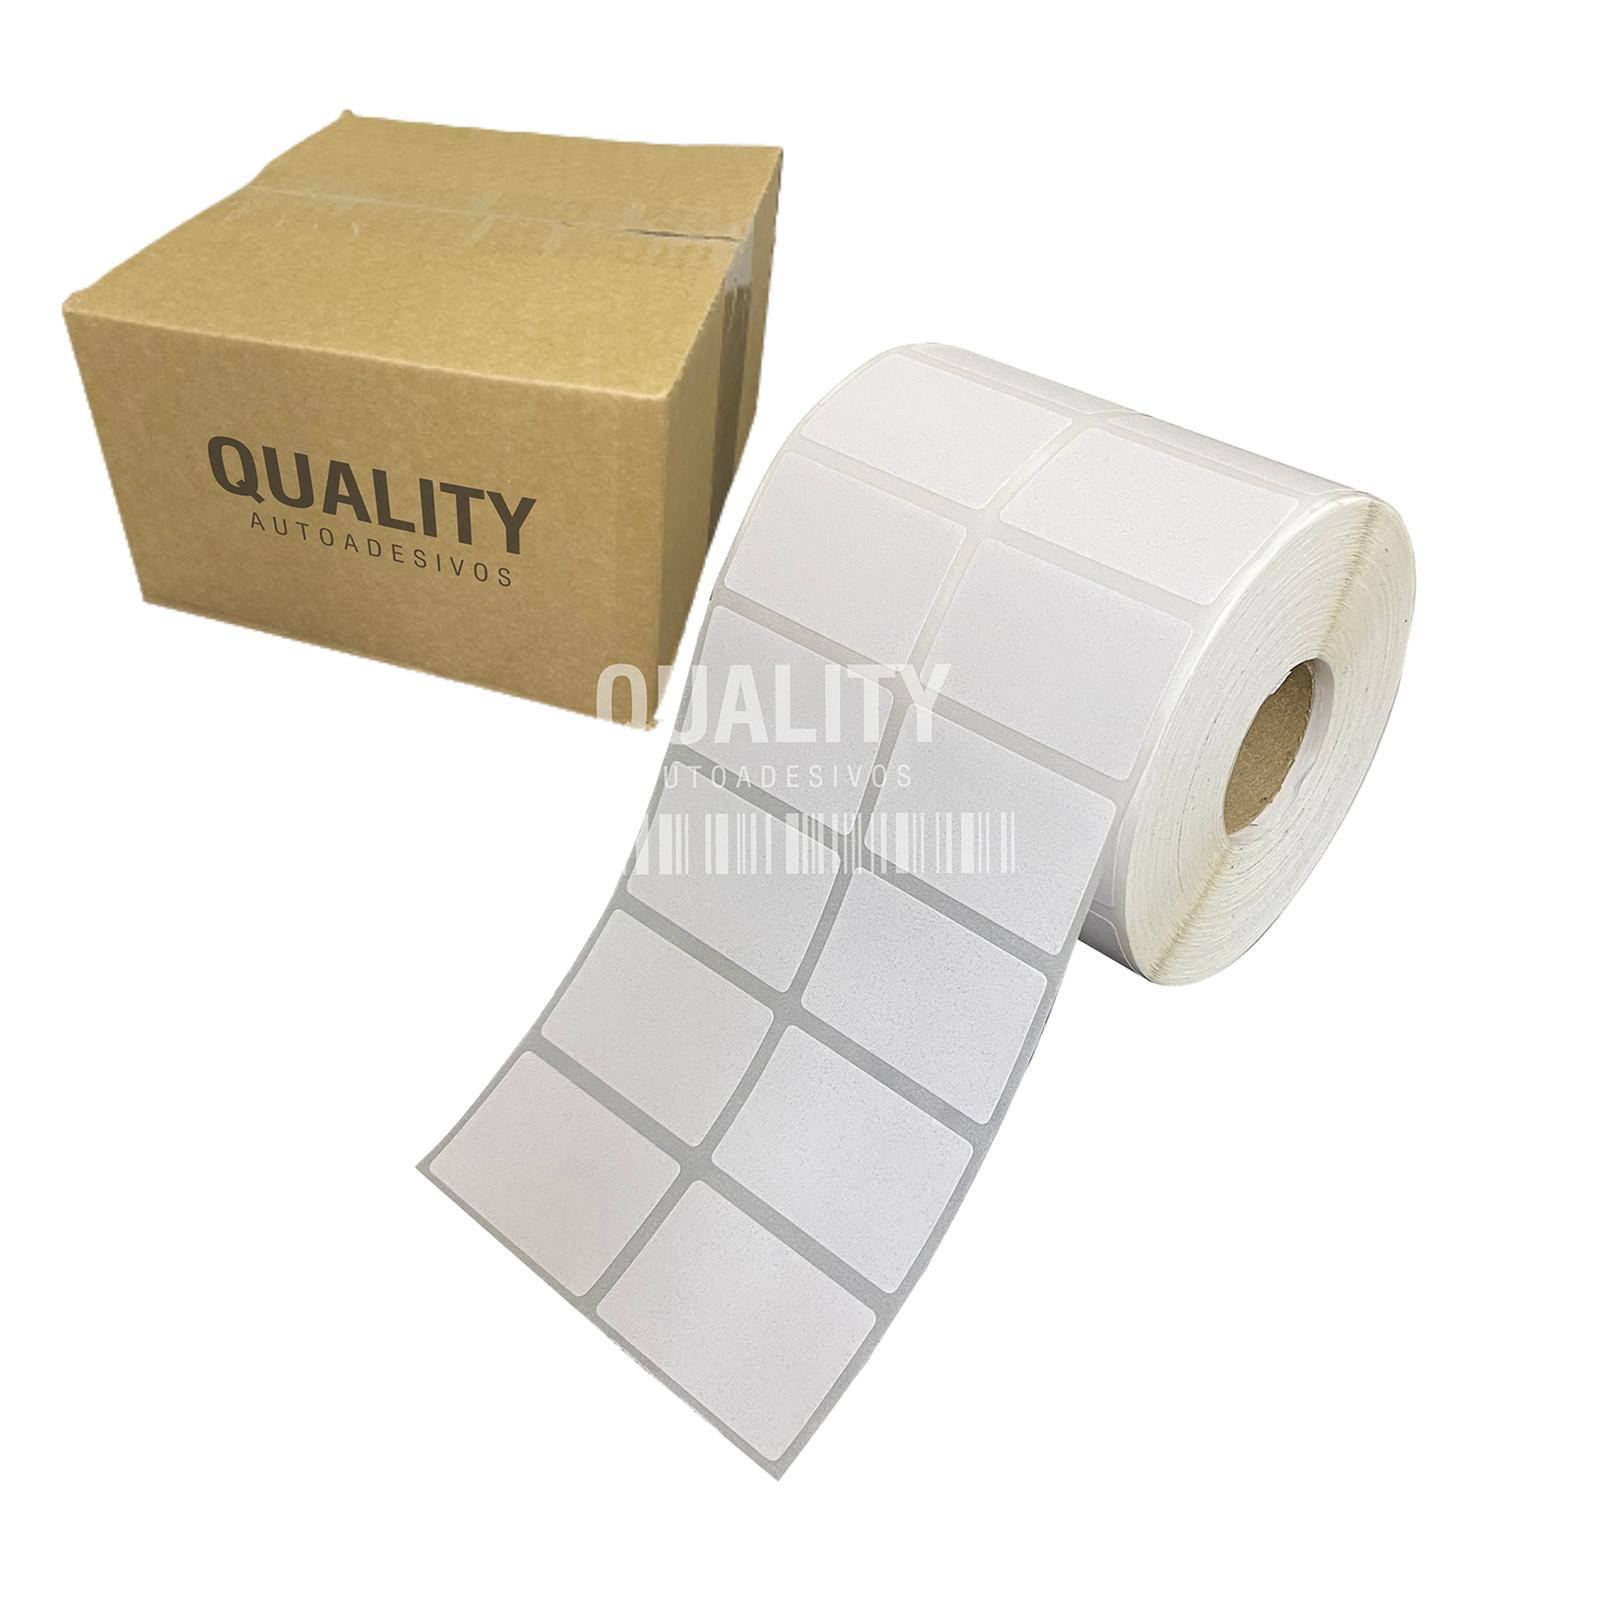 1000 Etiqueta Térmica 40x25mm 2 Colunas